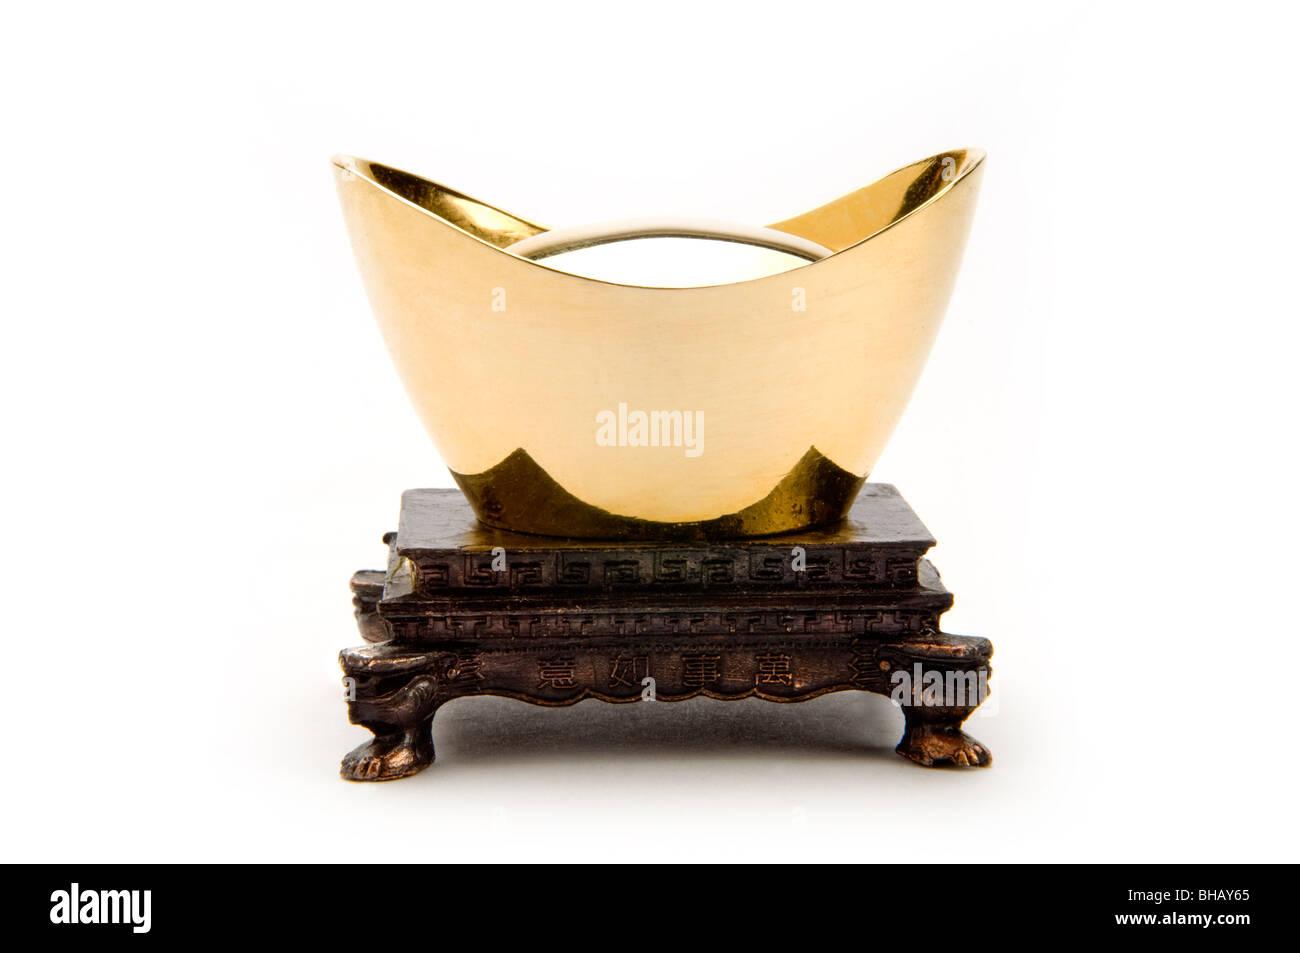 Chinese ingot - Stock Image